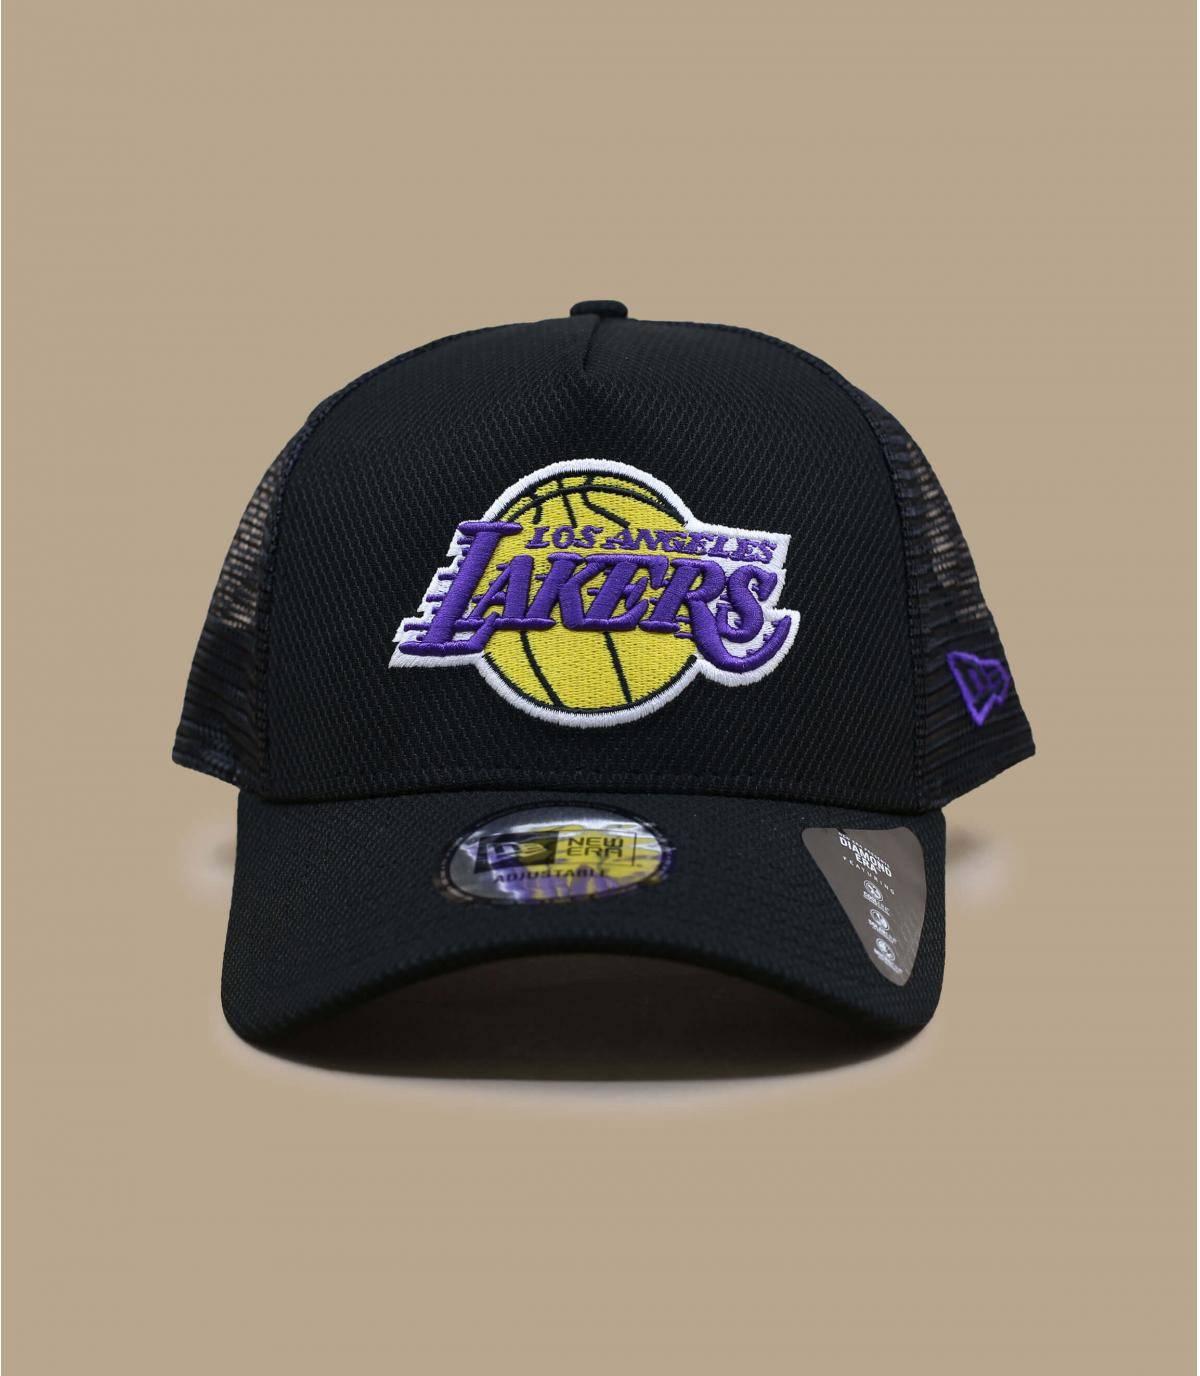 Black Lakers trucker